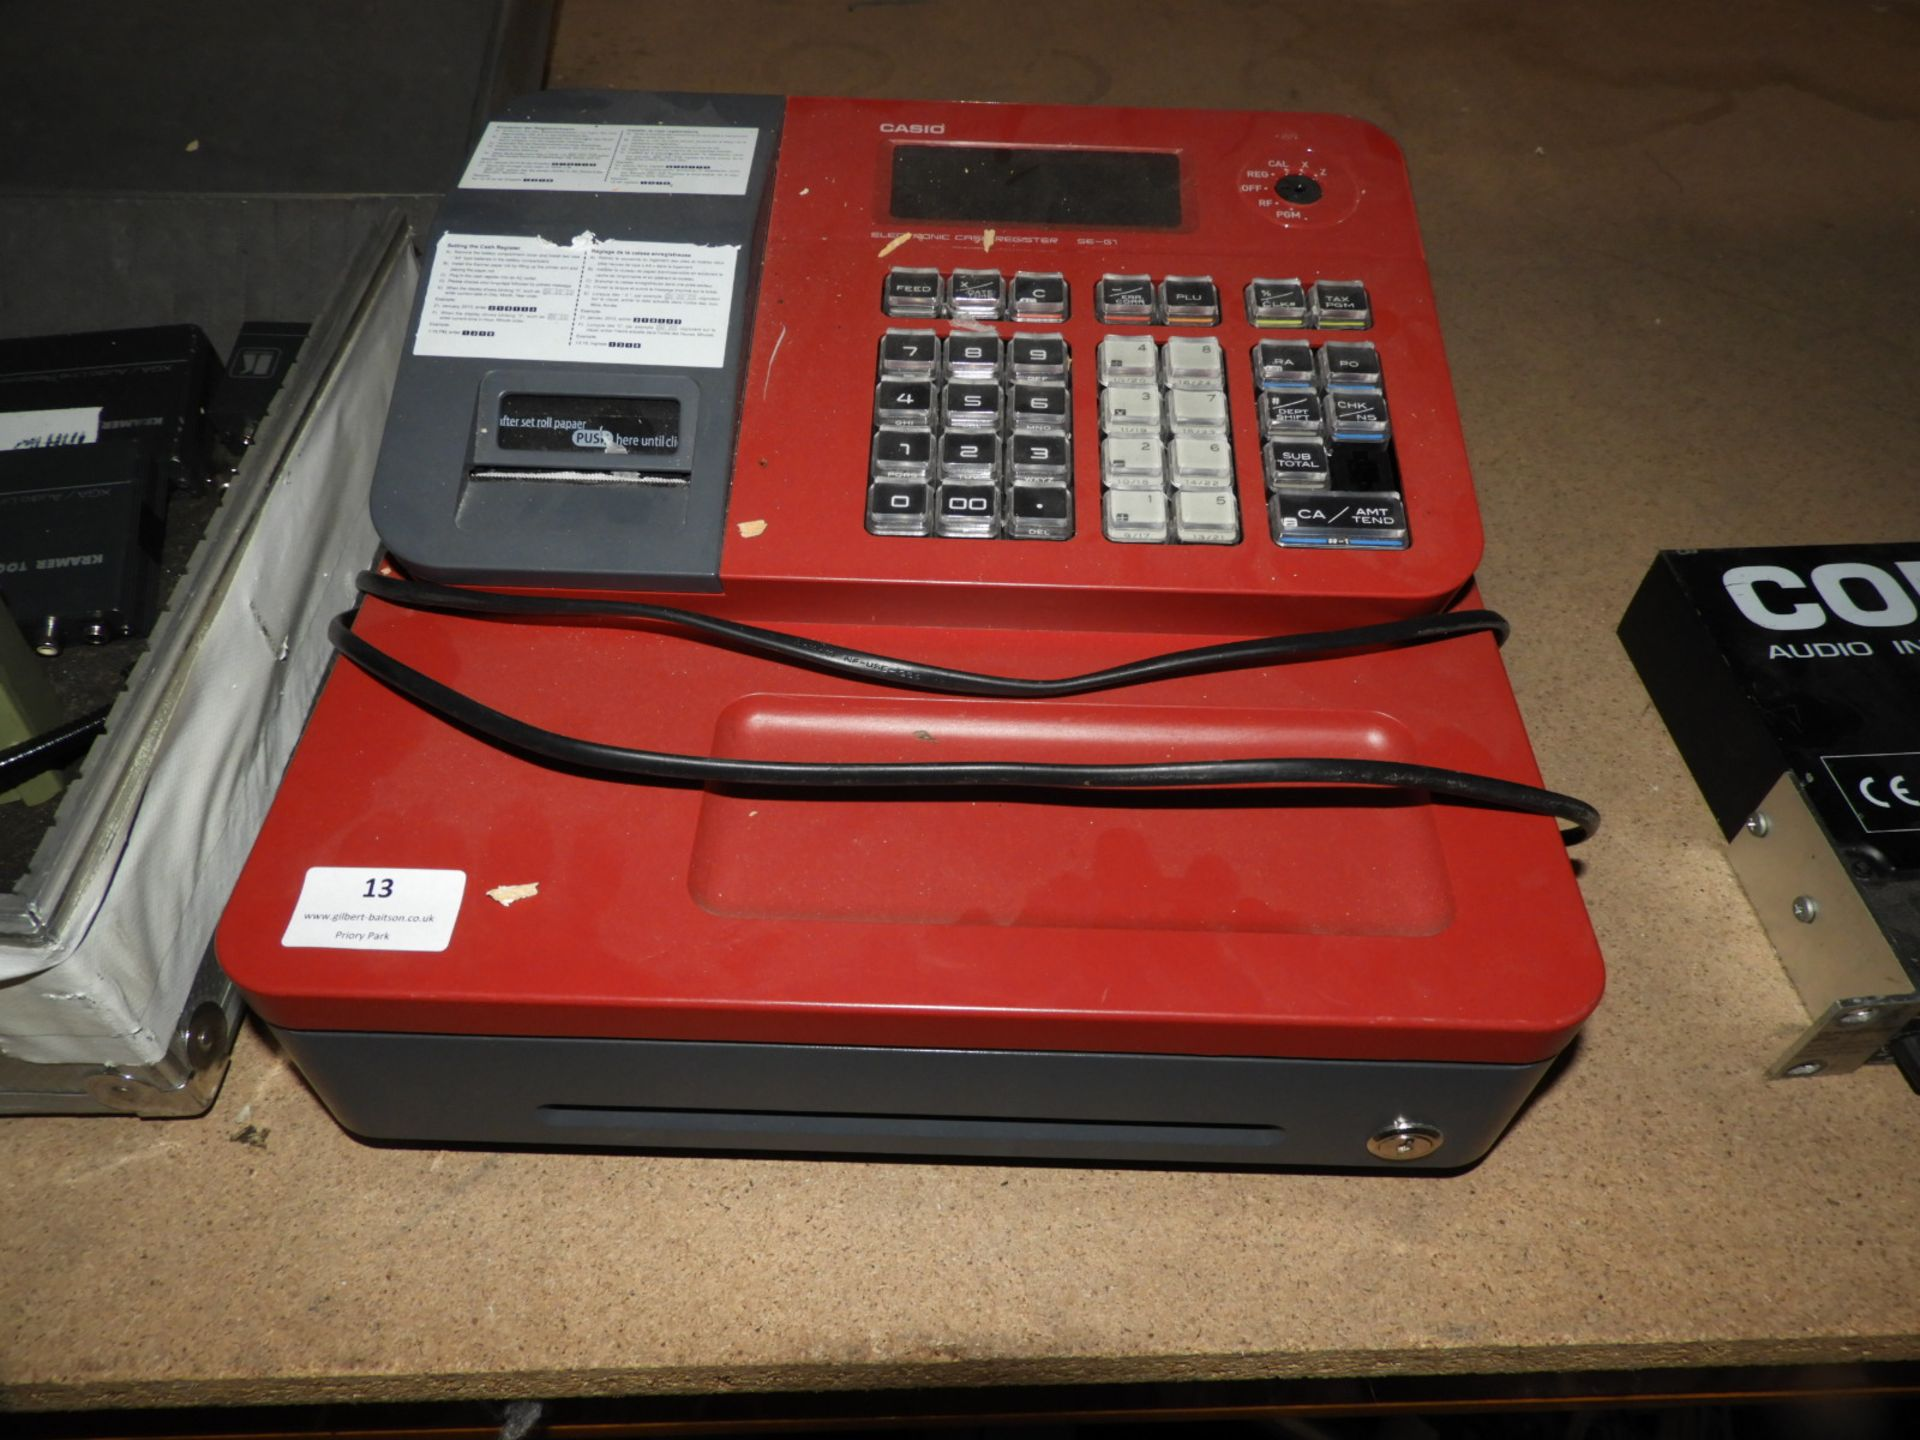 Lot 13 - *Casio Electronic Cash Register